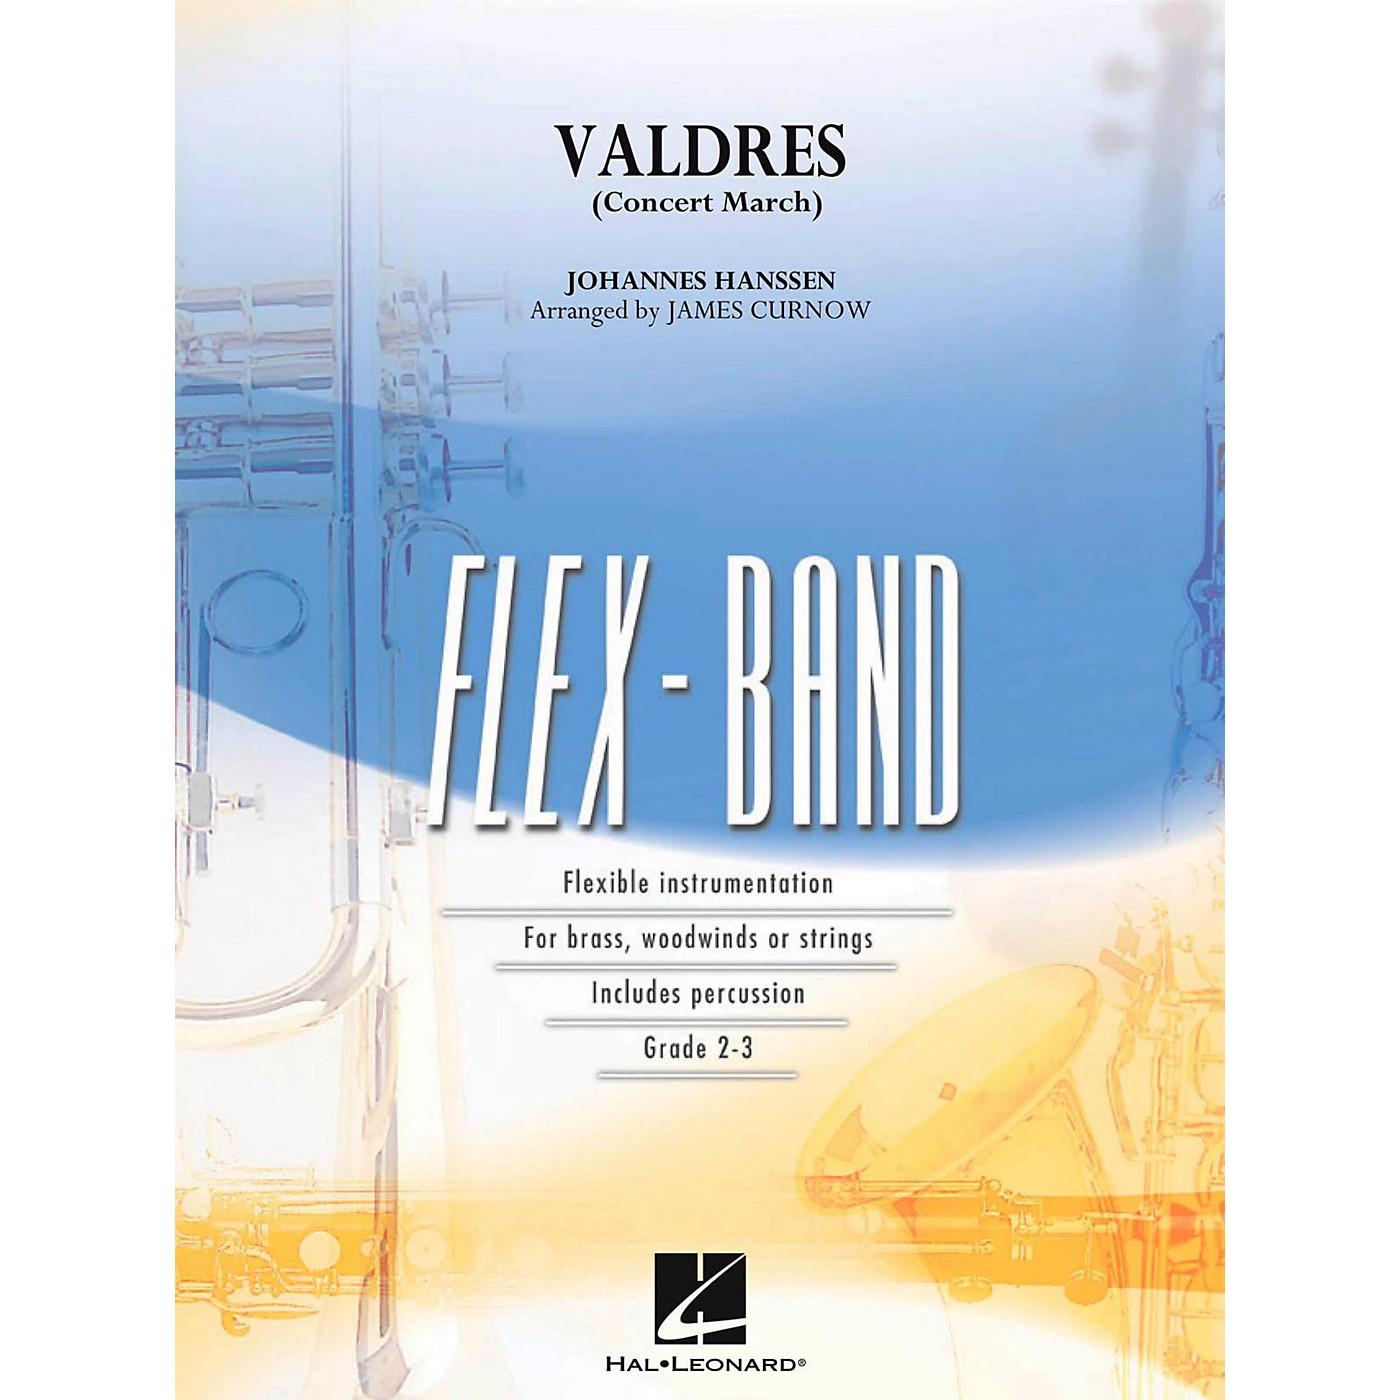 Hal Leonard Valdres (Concert March) FlexBand Concert Band Series Level 2 - 3 thumbnail